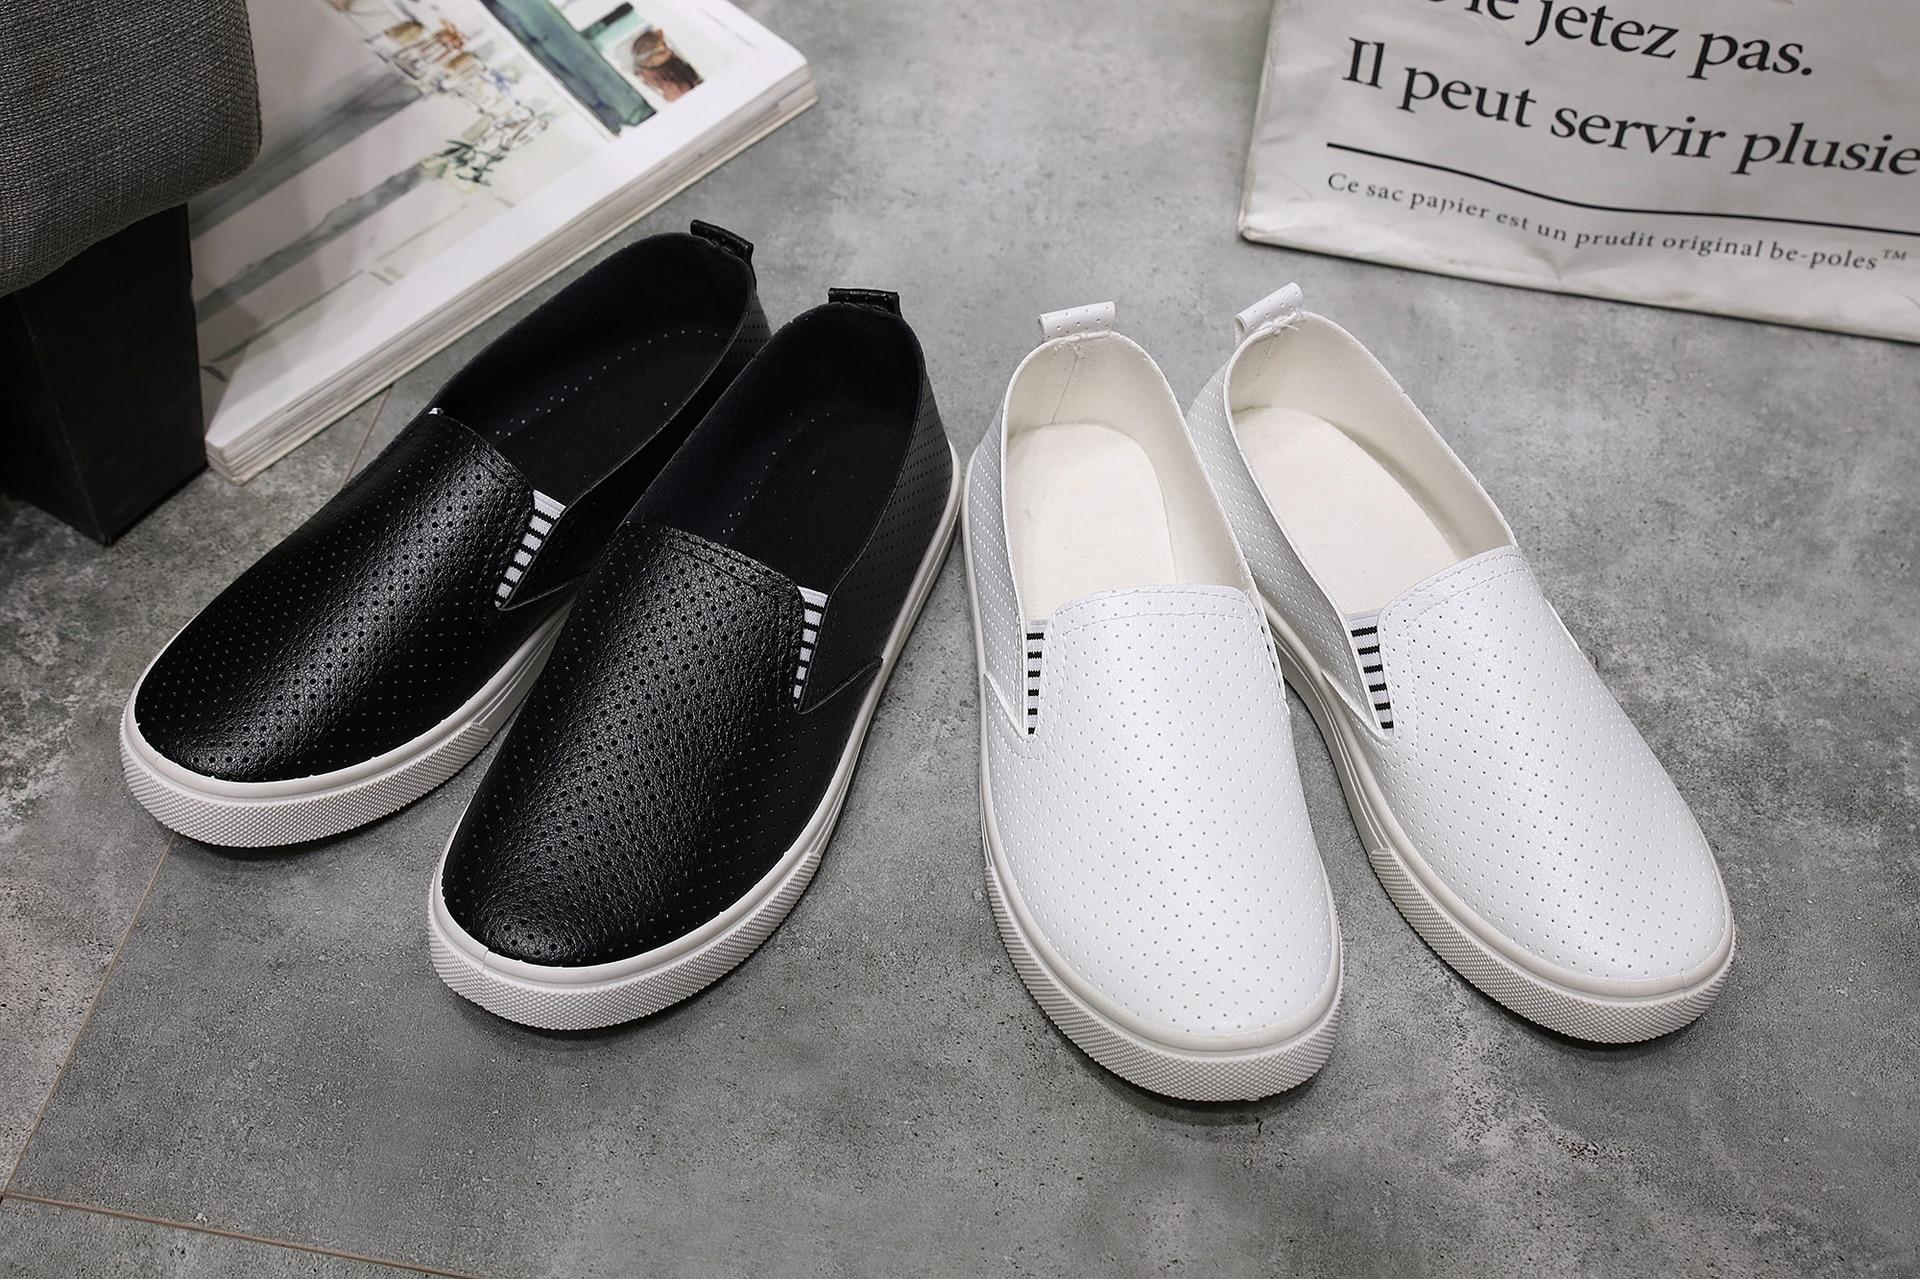 2017 Spring  Autumn Fashion New Shoes PU Small White Shoes Student Shoes Casual Shoes 2017 new fashion spring